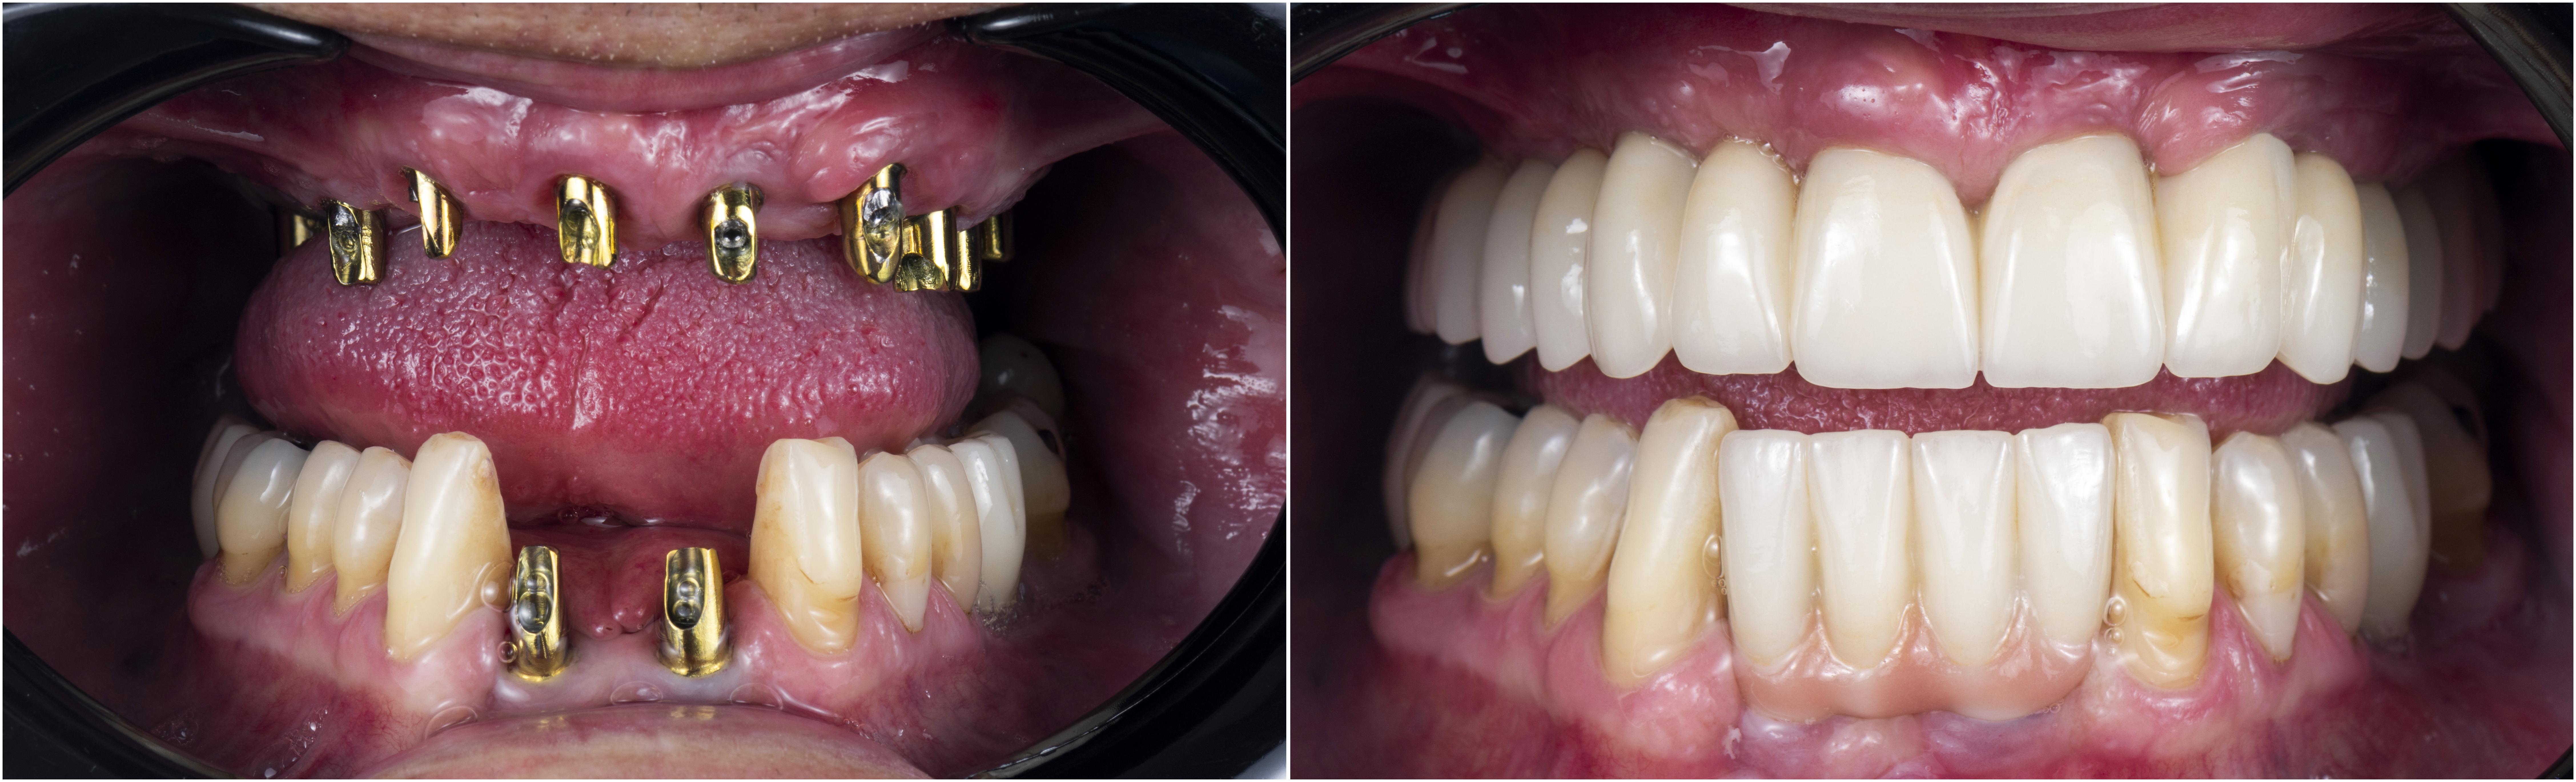 dental implants before and after viviane trinh dmd